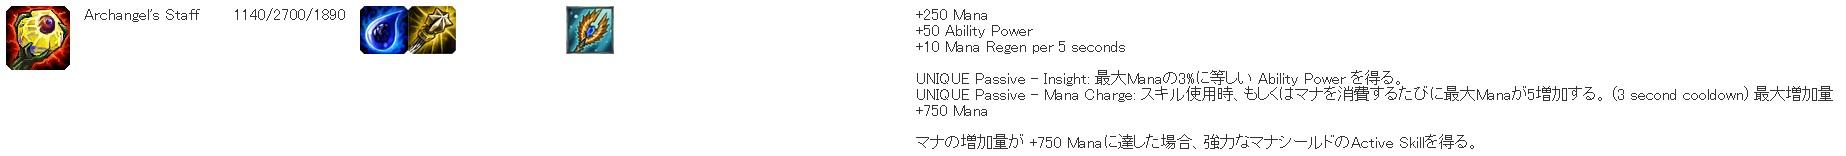 item7.jpg